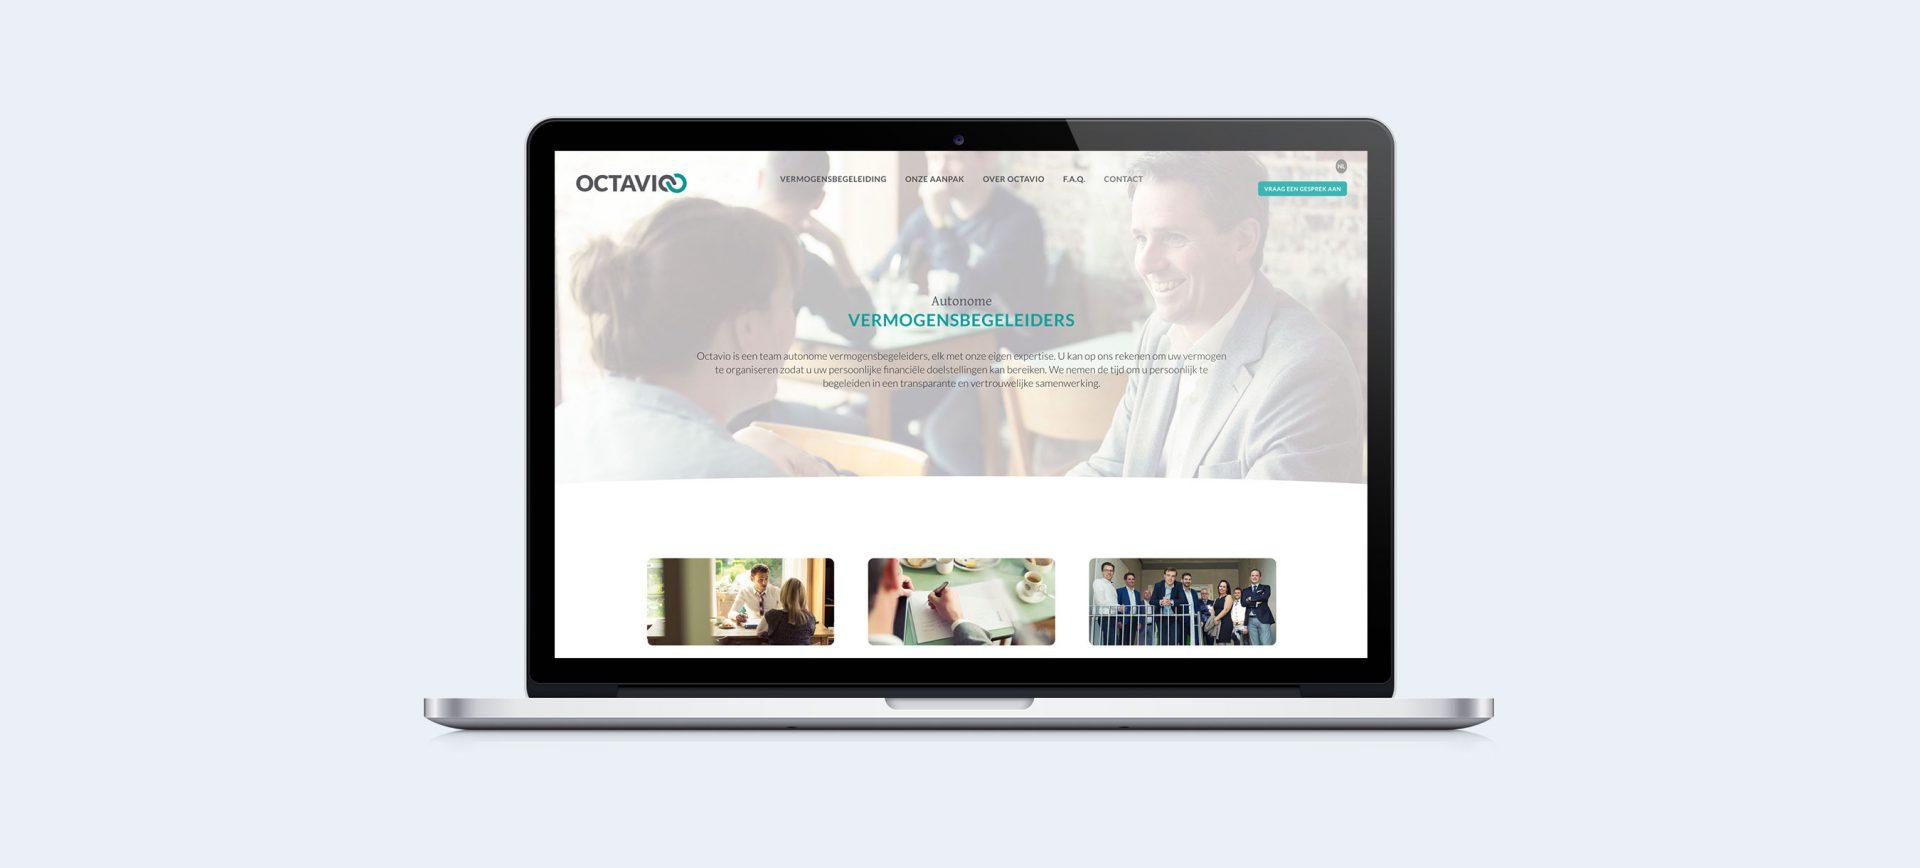 project-octavio-image_3